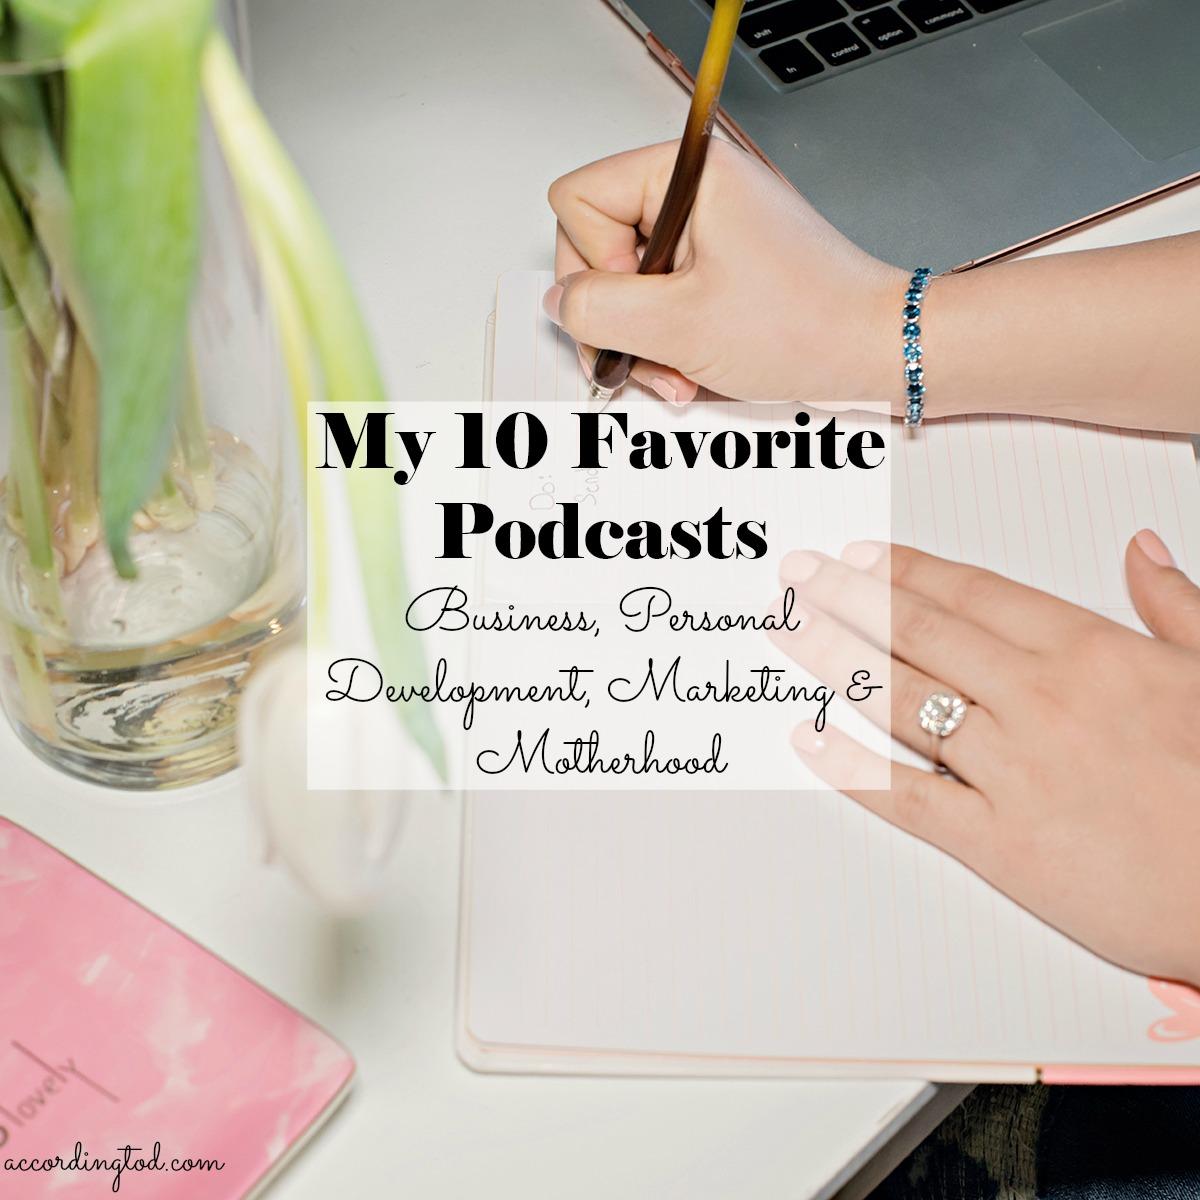 10 favorite podcasts.jpg